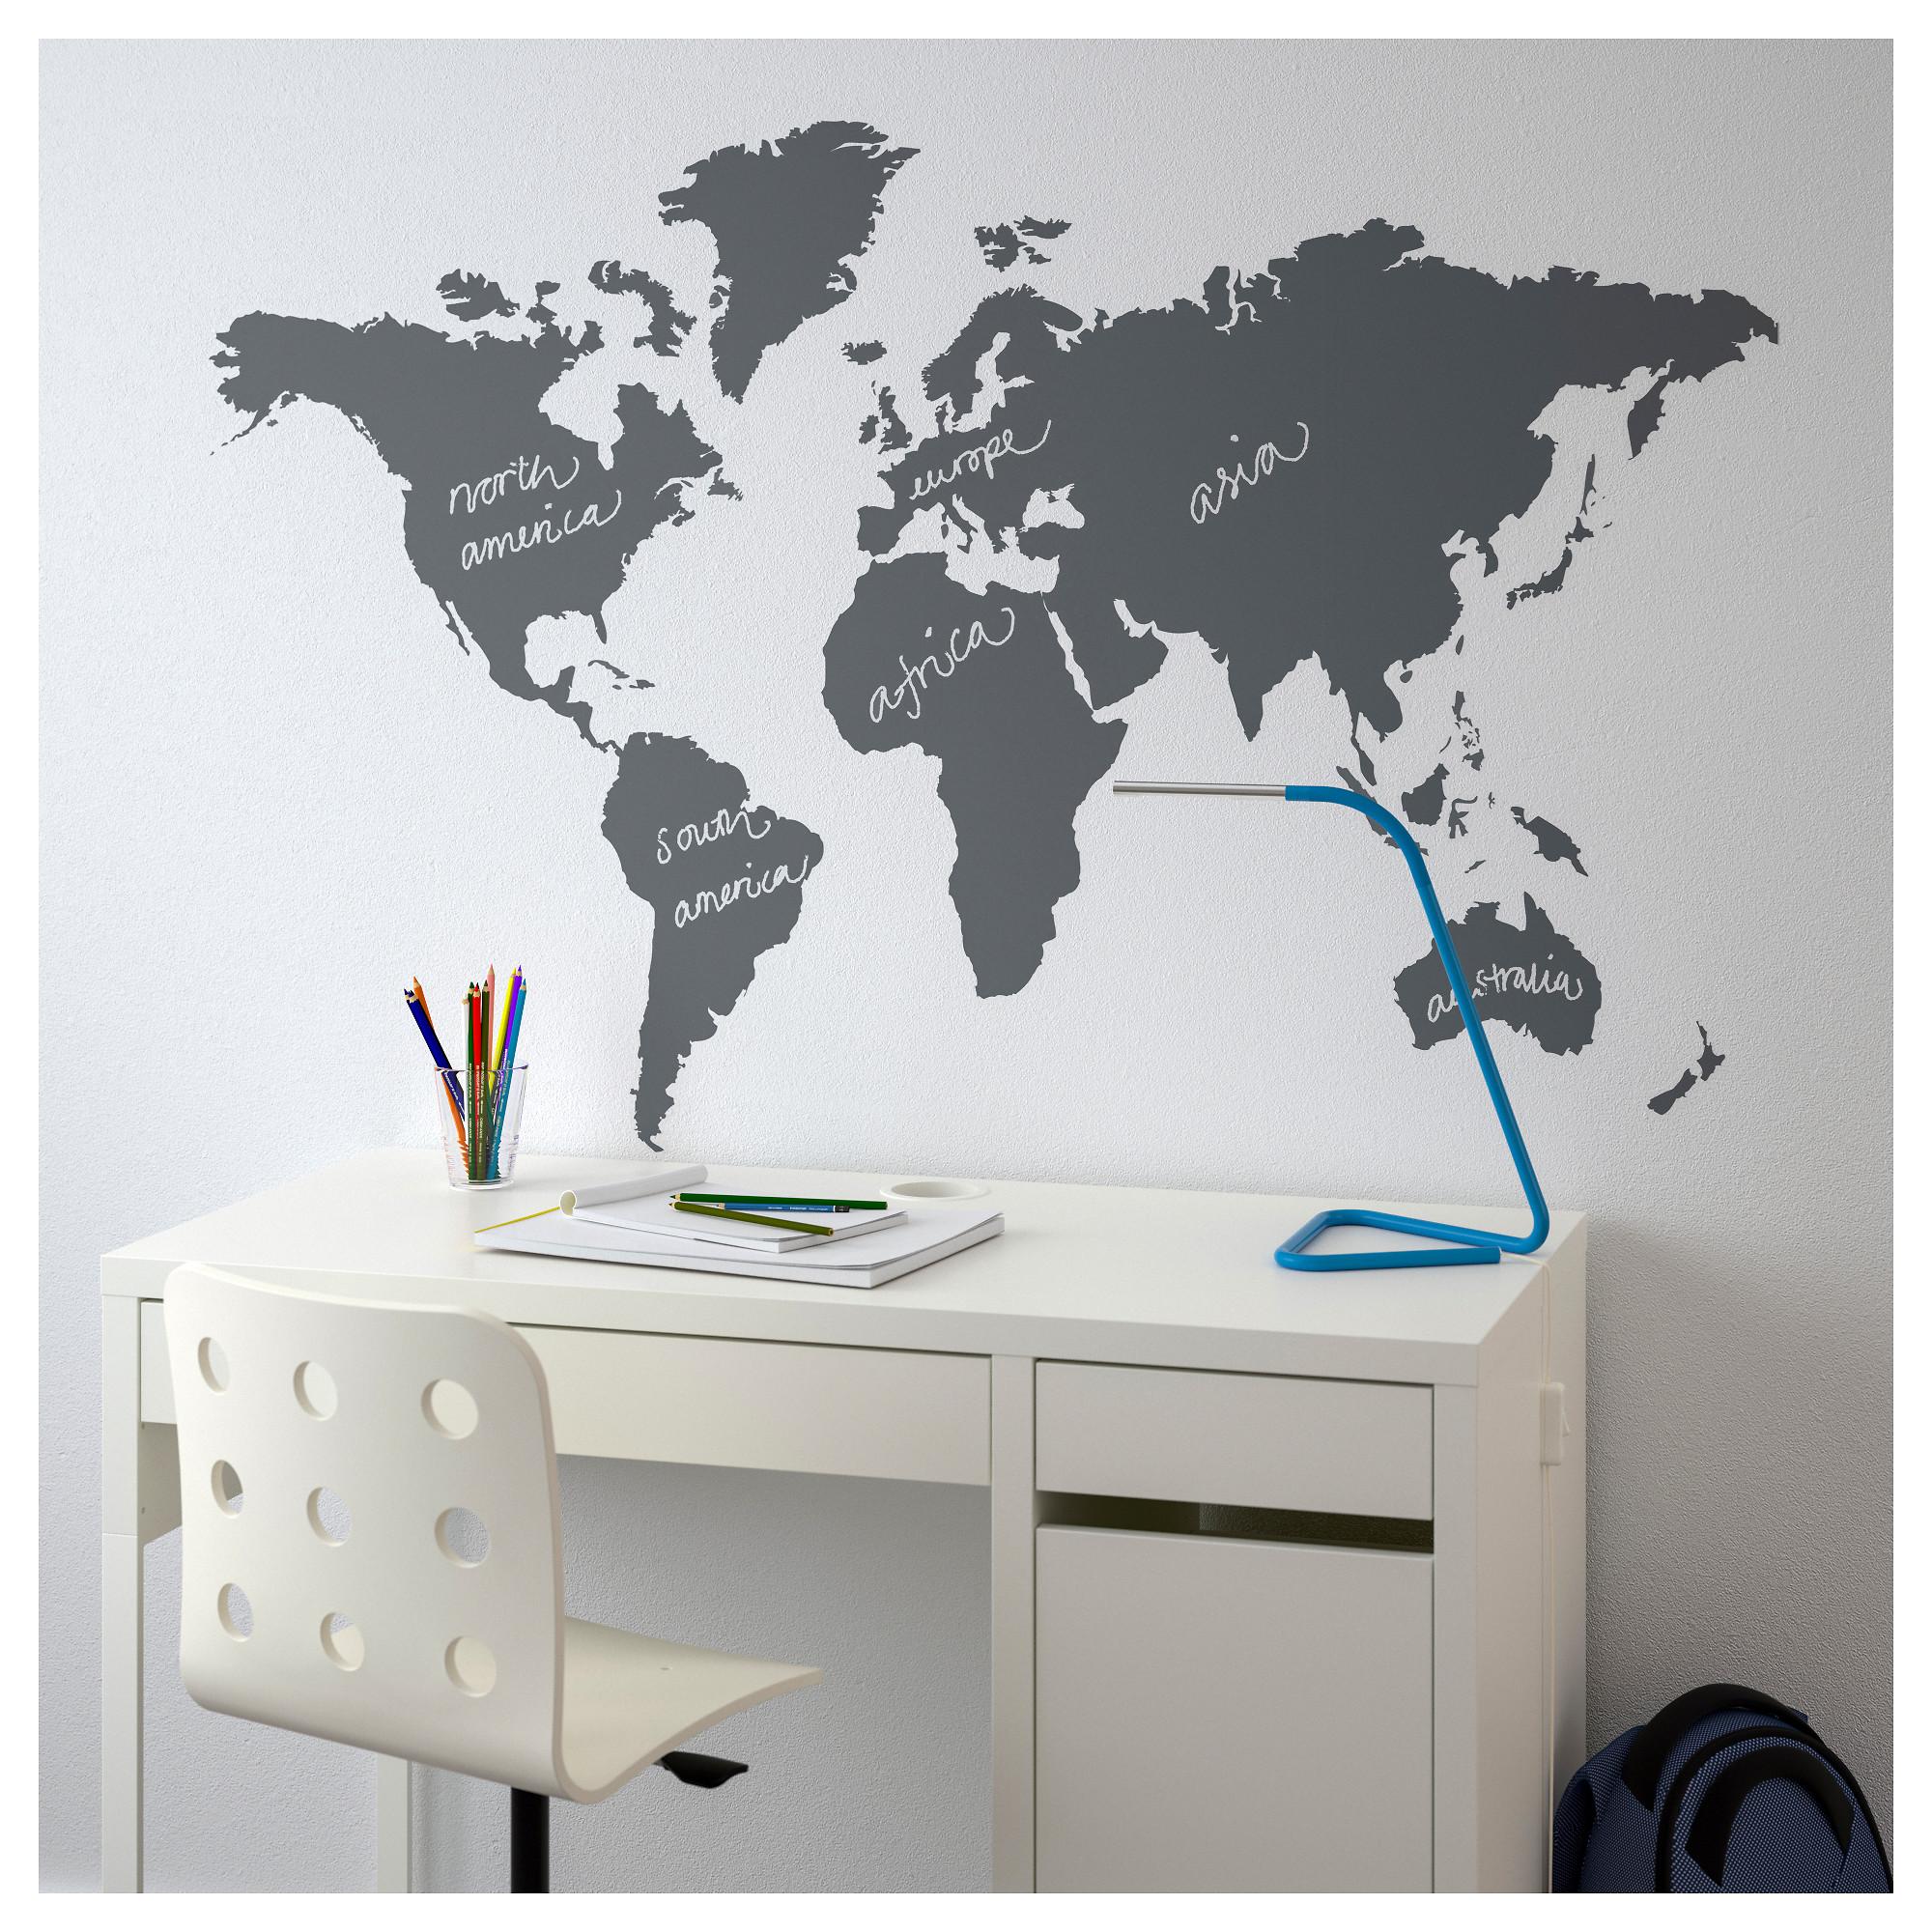 IKEA - KLÄTTA Decorative stickers chalkboard world in 2019 ... Ikea World Map Room on world map baby room, yuichi world map room, manga world map room, comic world map room, world map living room,